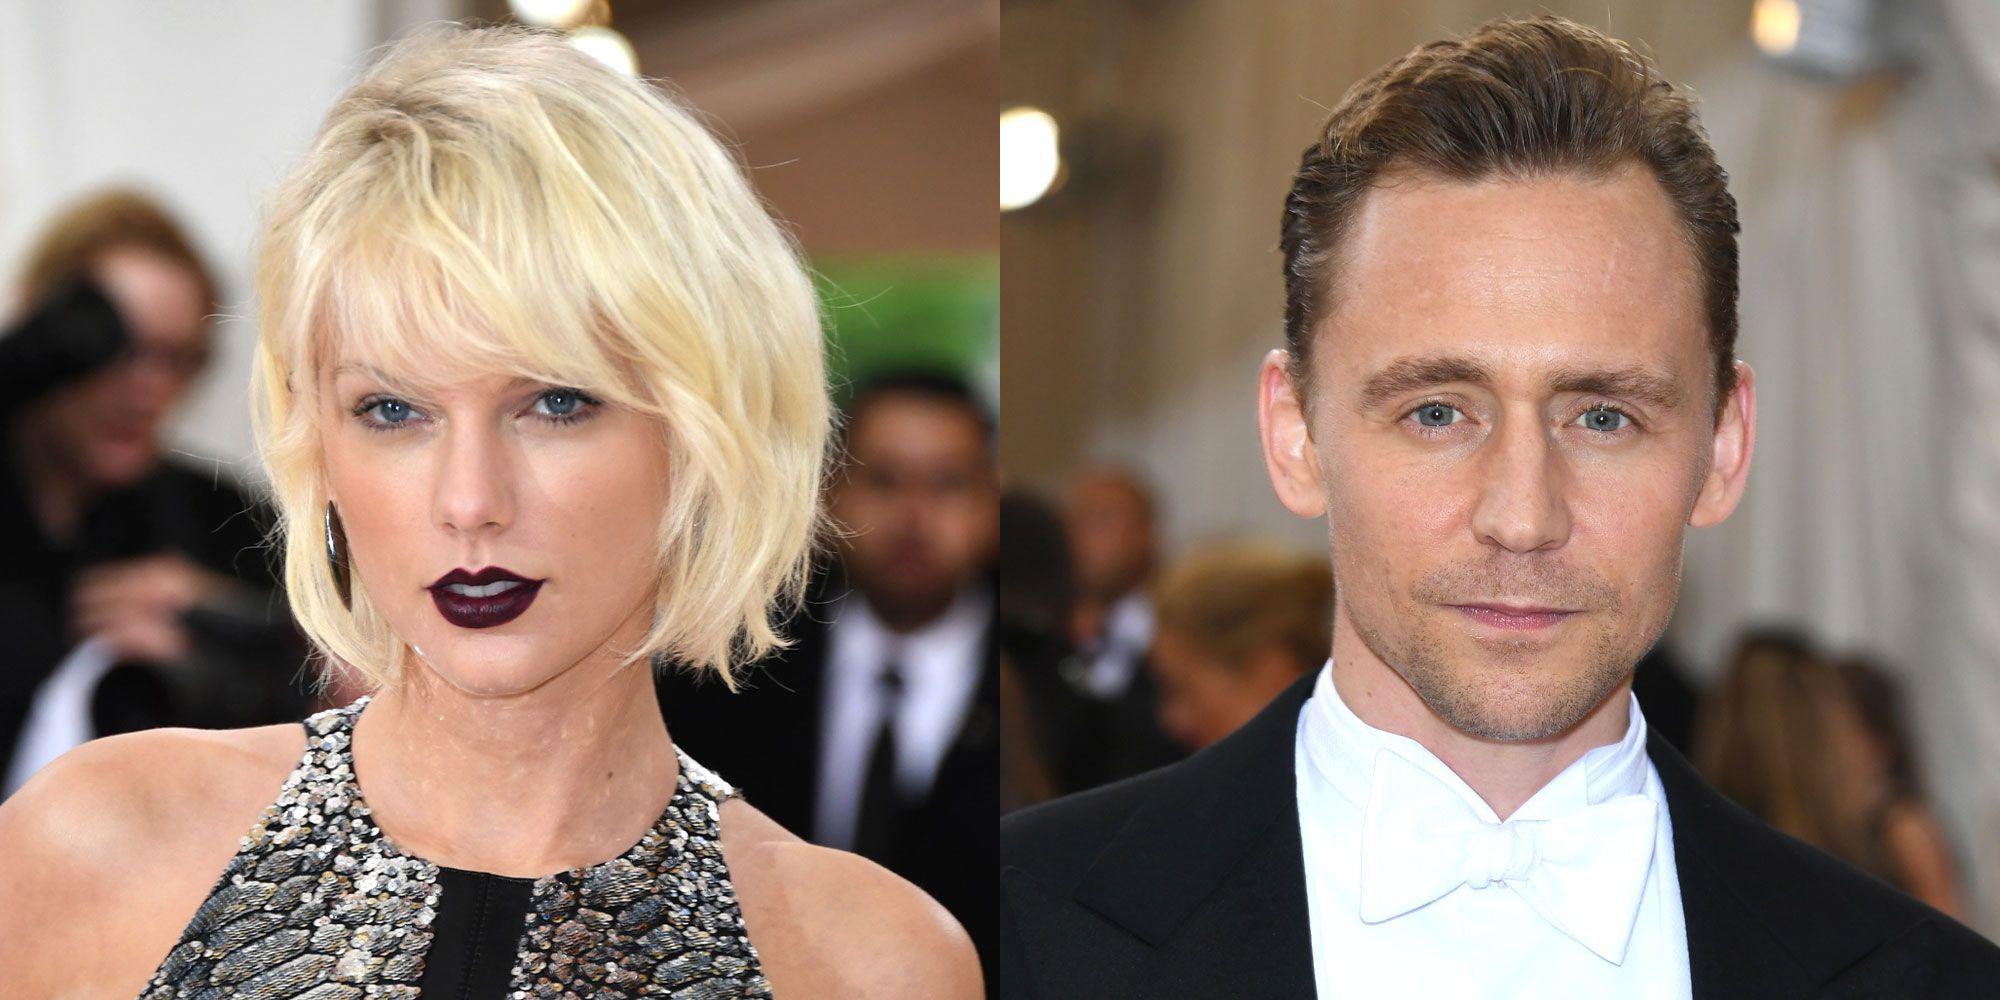 Taylor Swift And Tom Hiddleston Pda Photos 2016